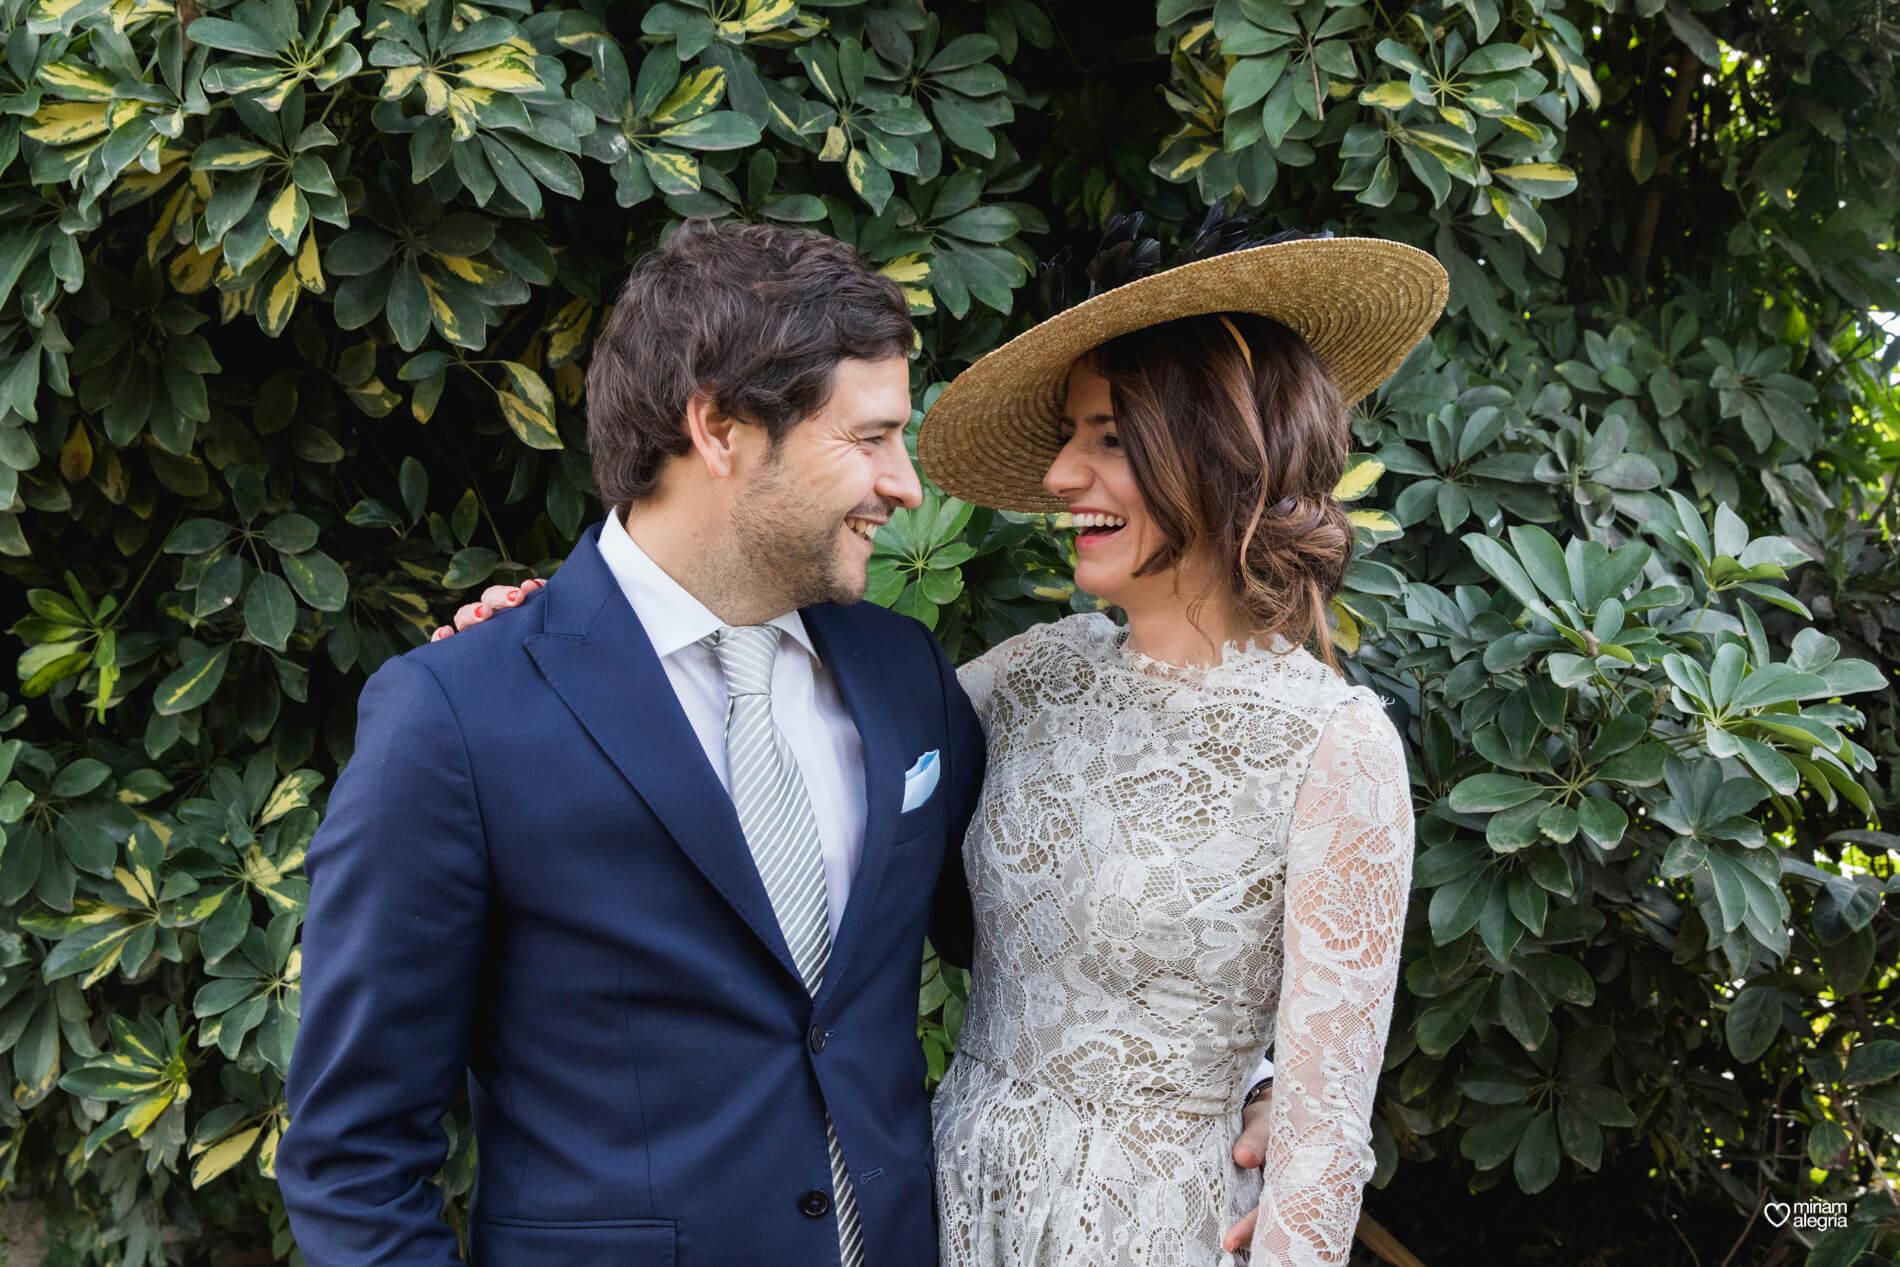 vestido-de-novia-paula-del-vas-miriam-alegria-fotografos-boda-murcia-107